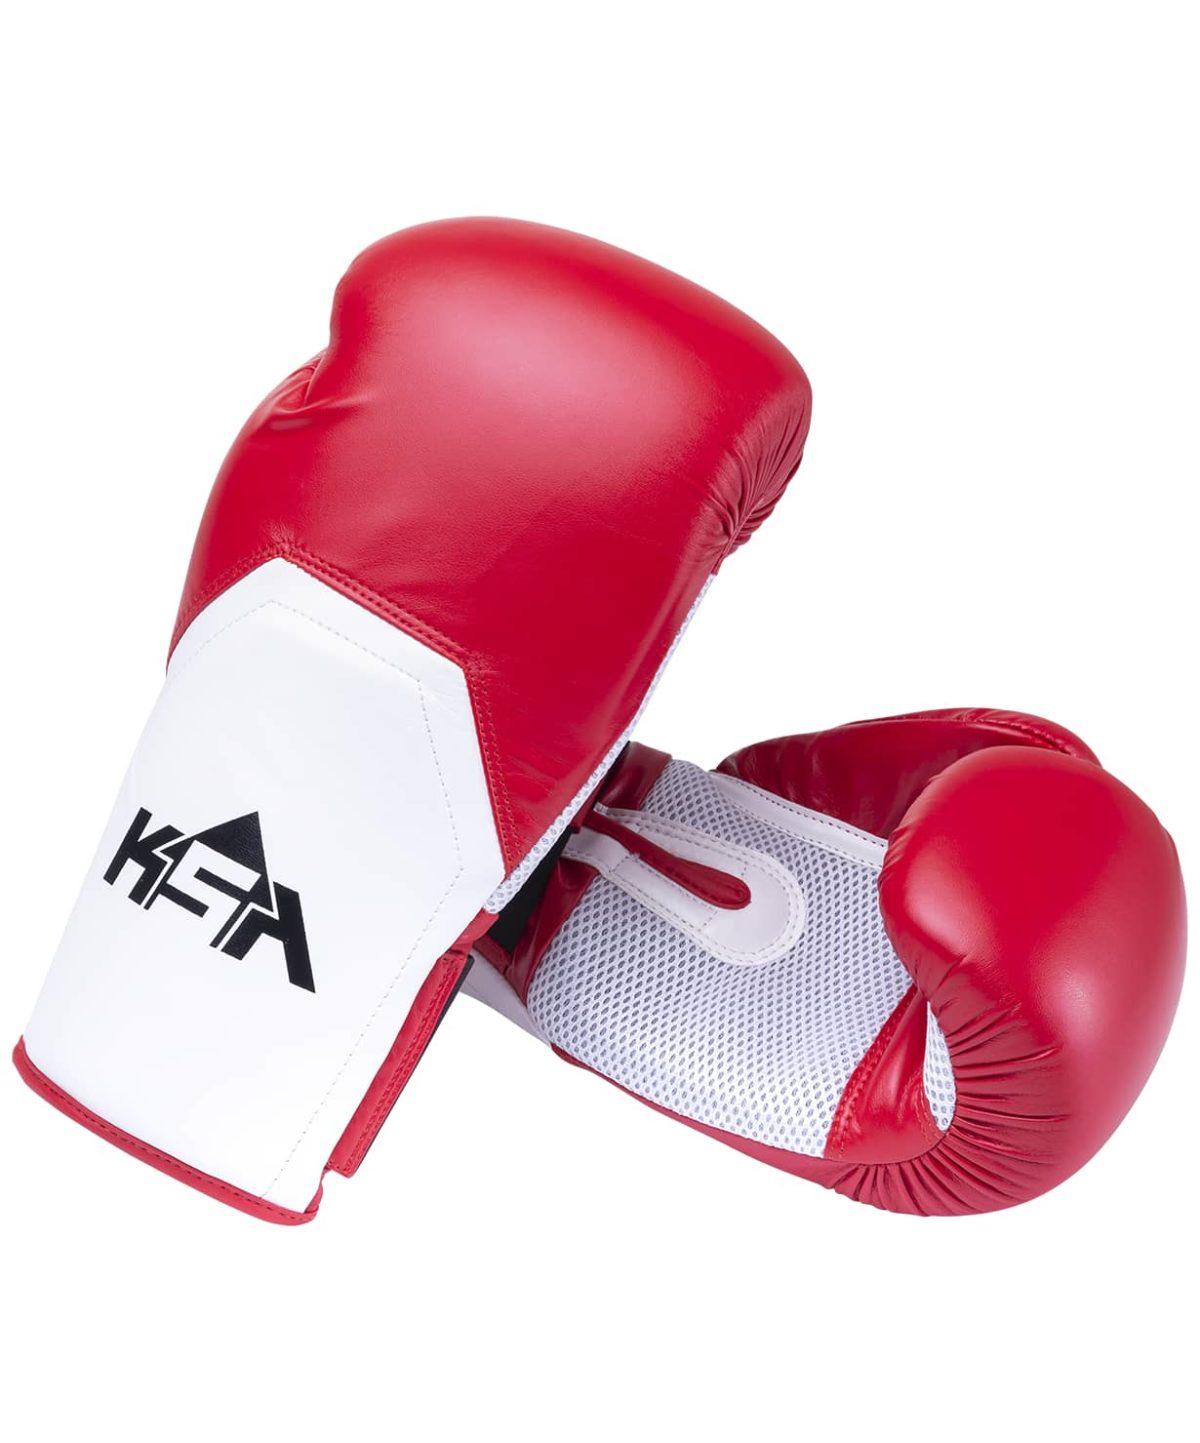 KSA Scorpio Red Перчатки боксерские, 12 oz, к/з 17825 - 1